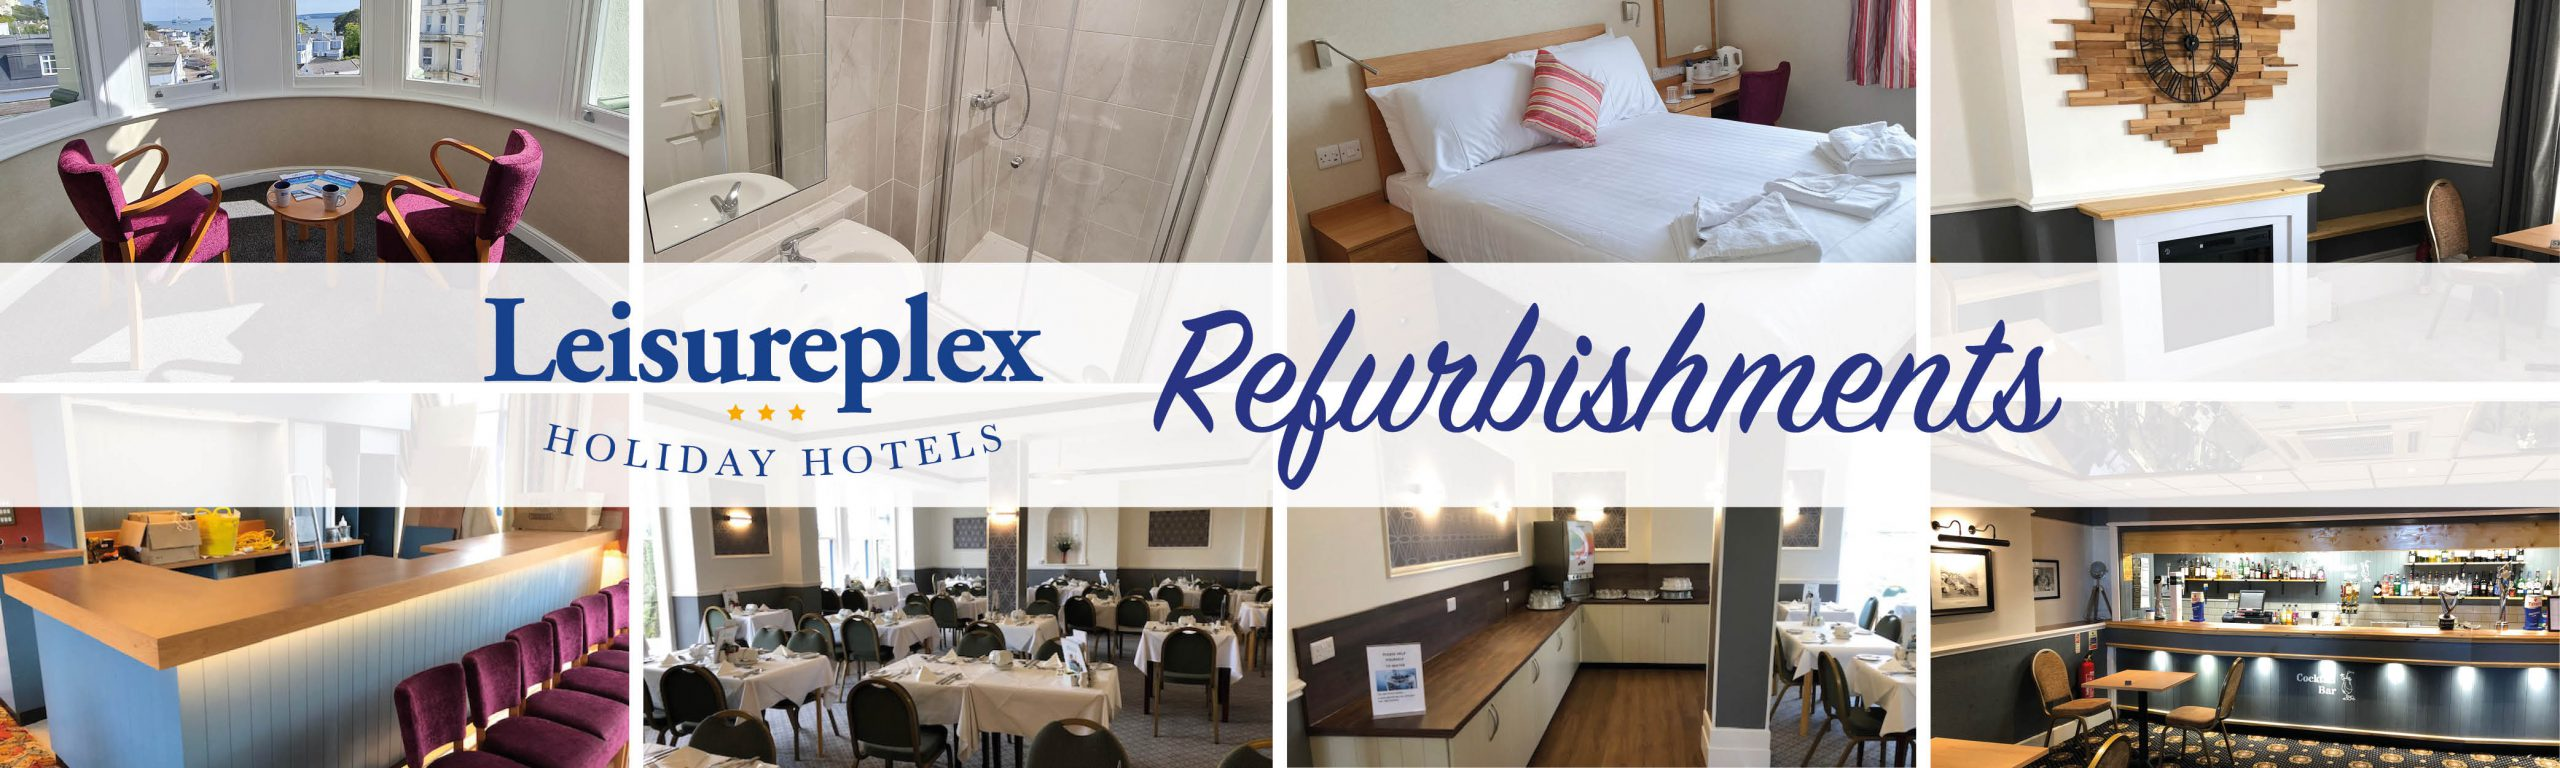 Hotel Refurbishment Leisureplex Uk seaside hotels